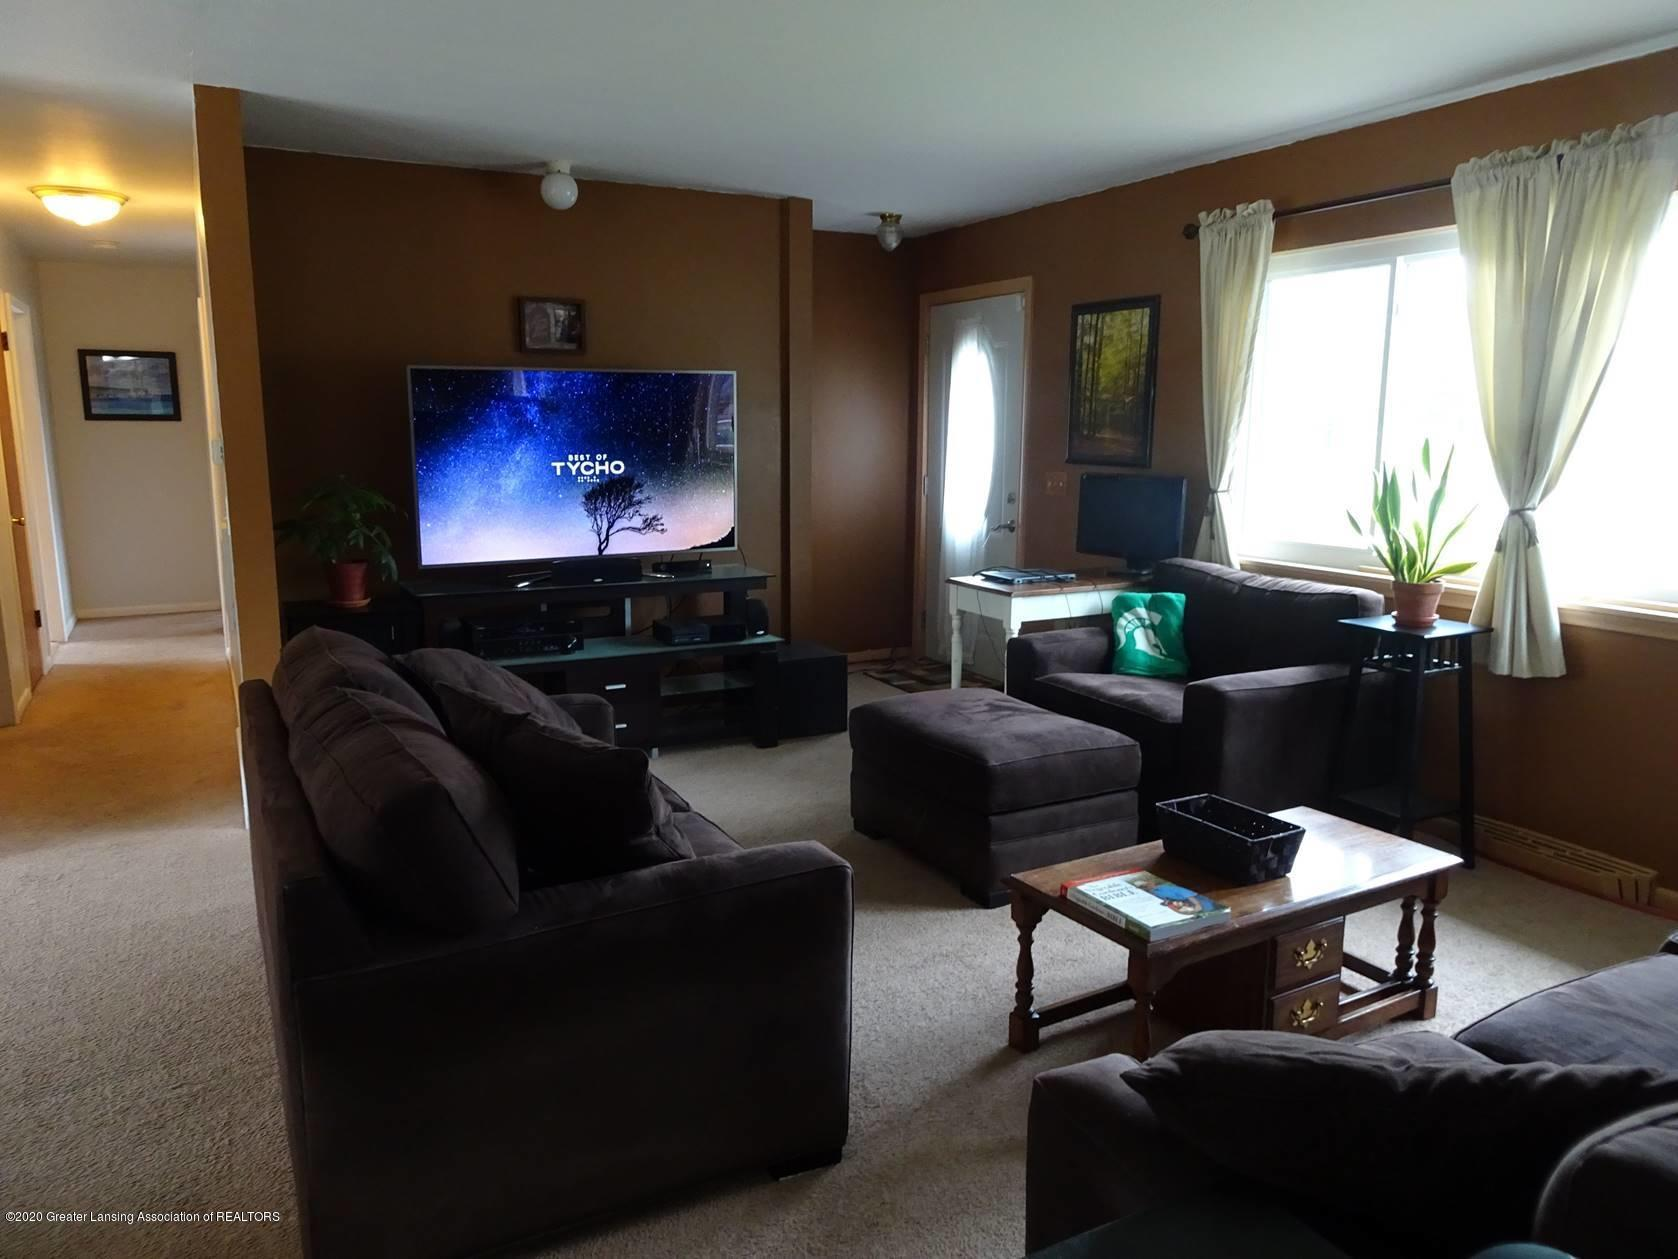 5354 N Michigan Rd - Family Room - 9